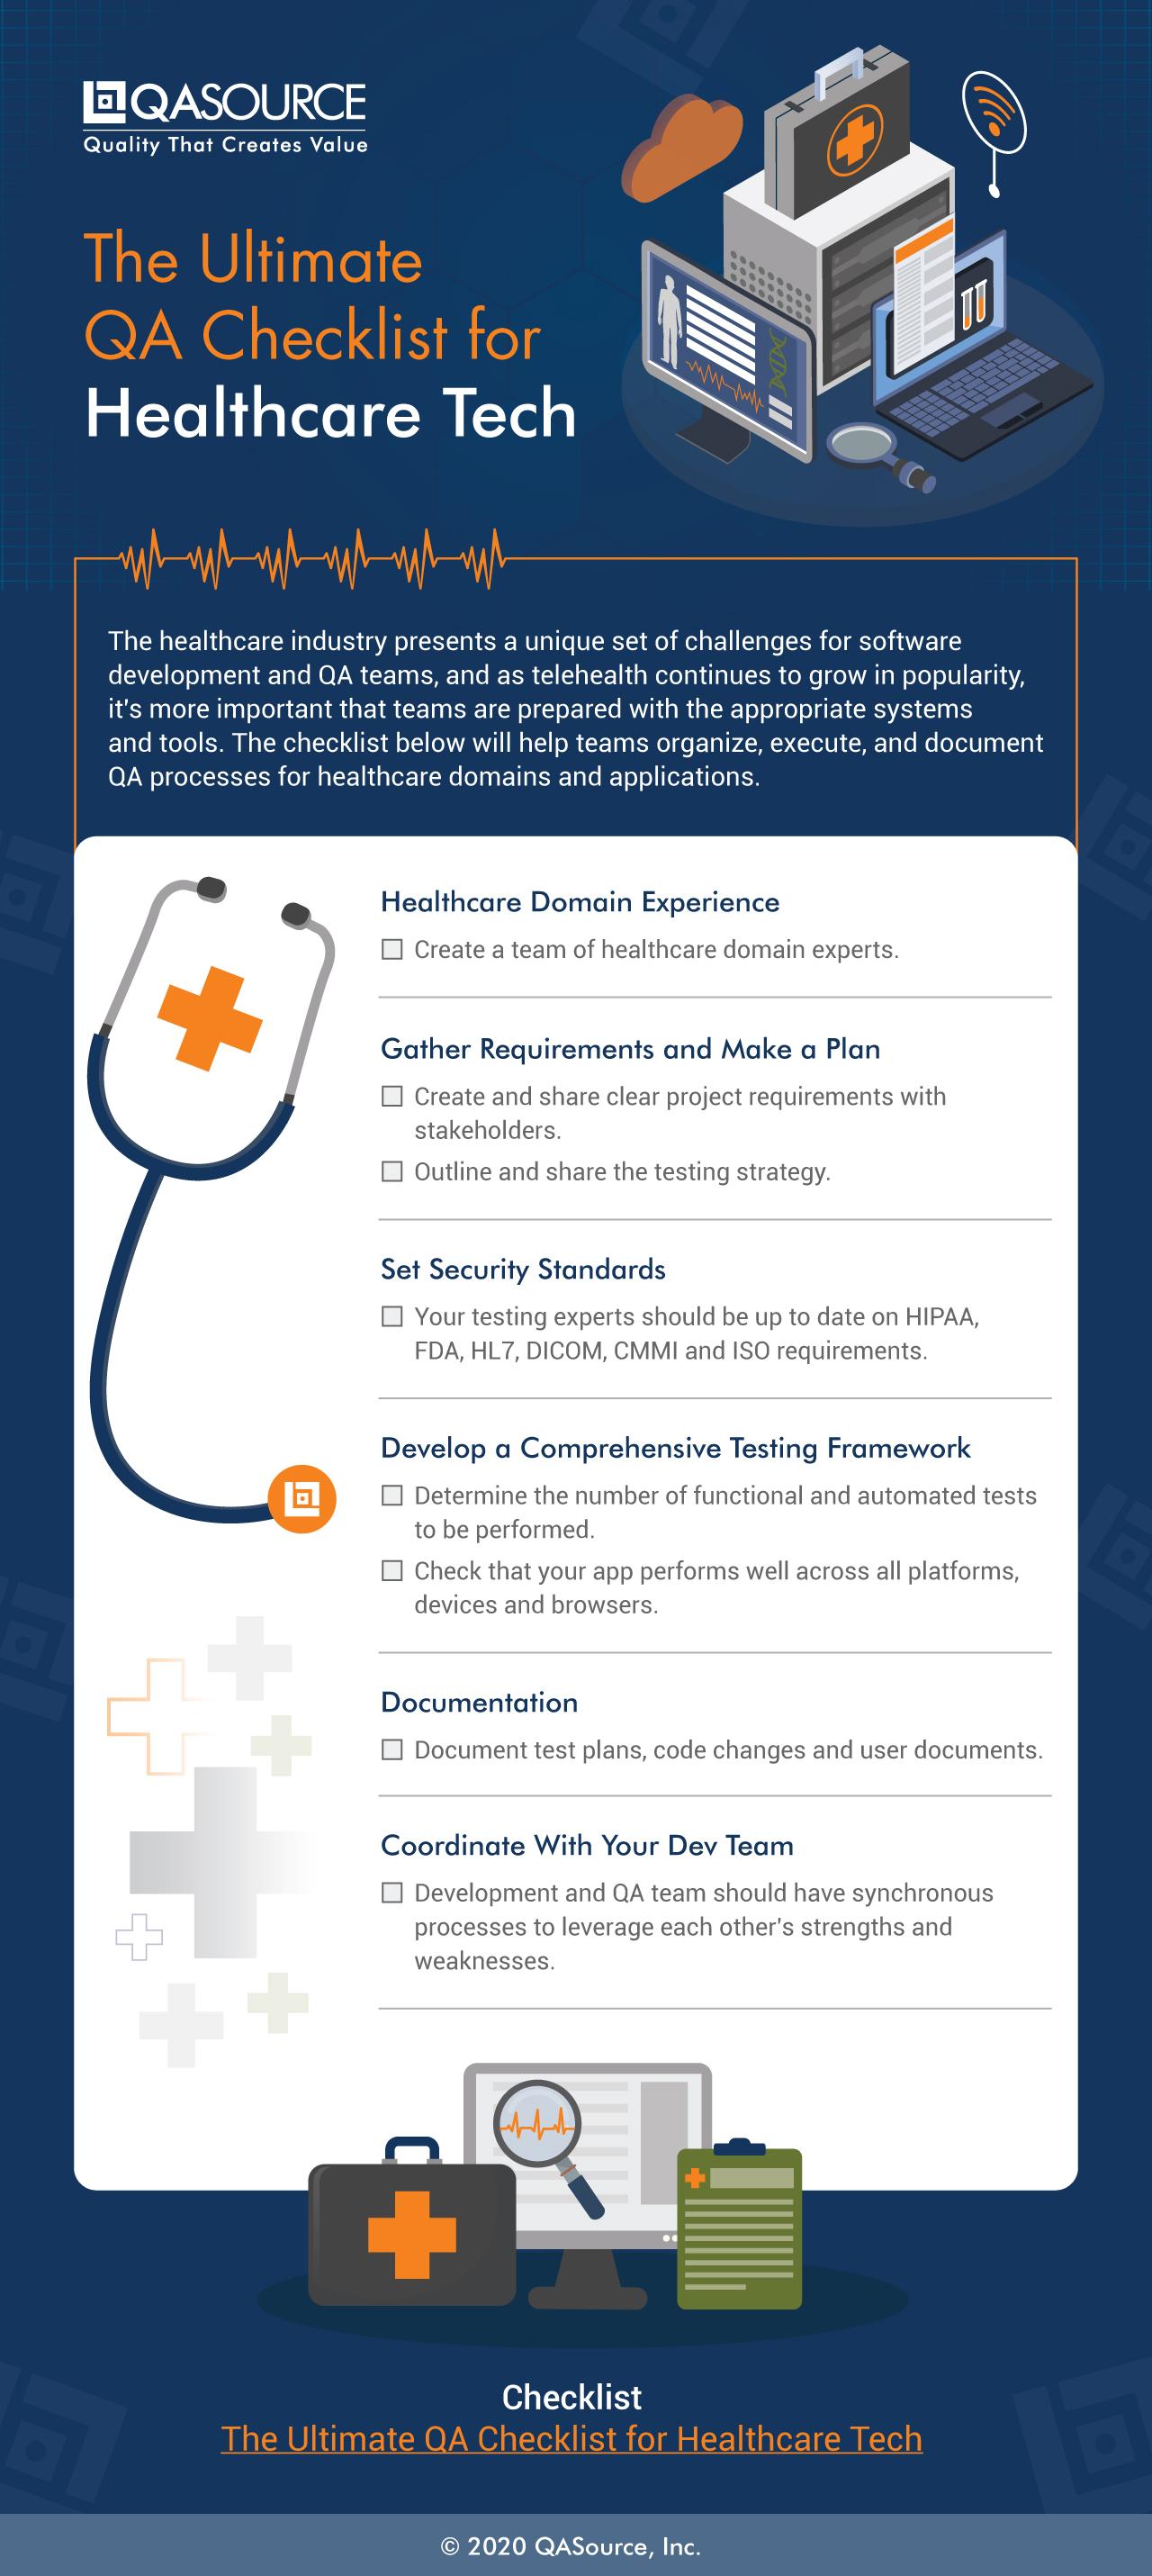 The Ultimate QA Checklist for Healthcare Tech